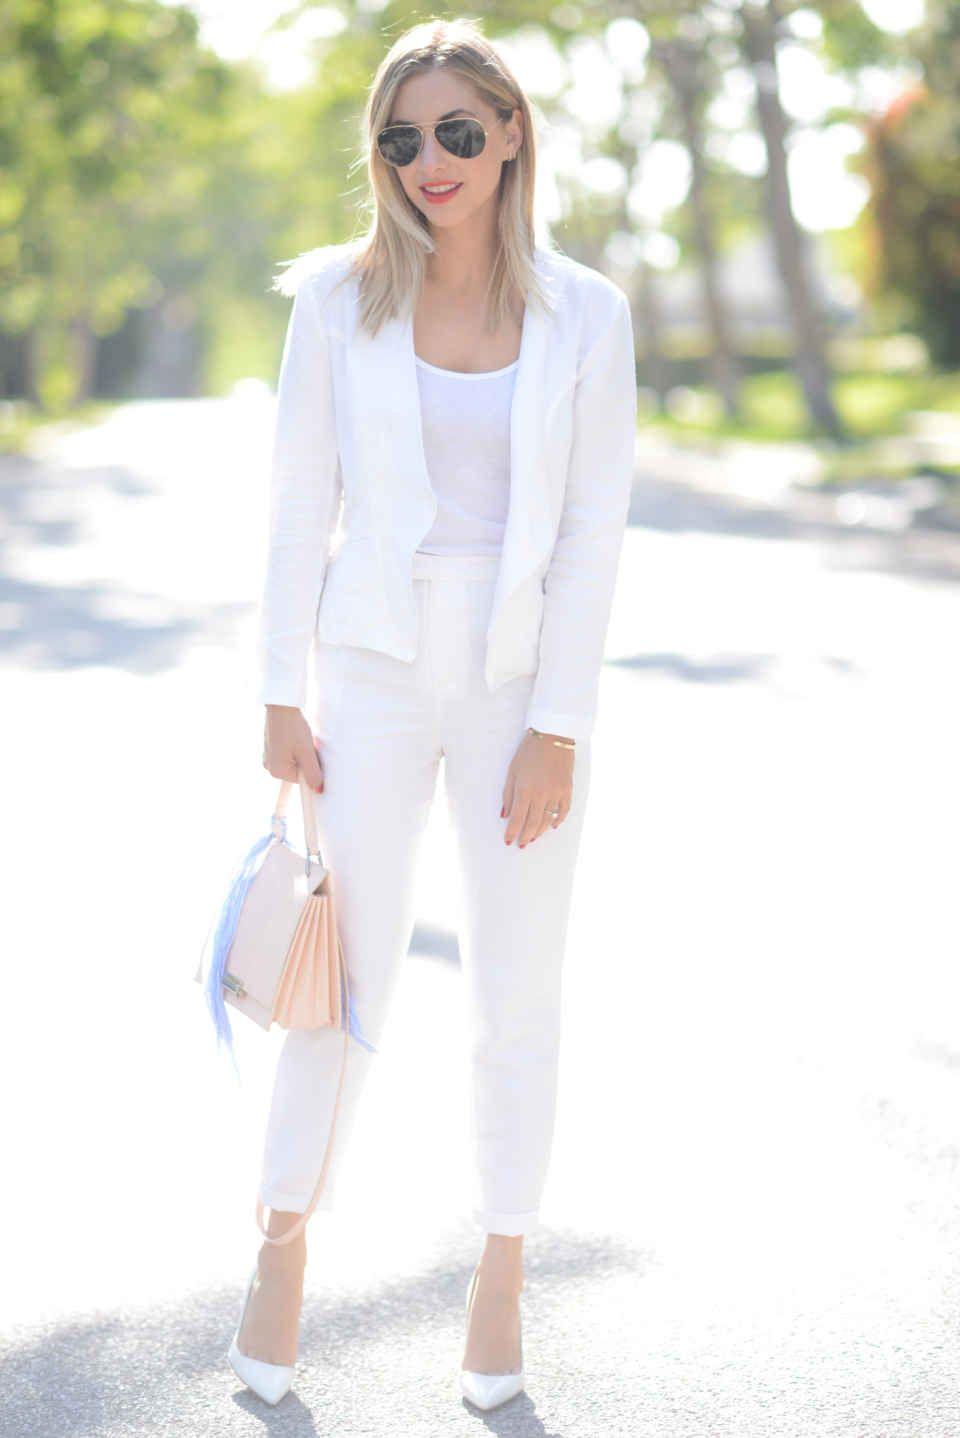 94851a6748 Summer Suiting | fashion | Summer suits, Cashmere suit, White suits